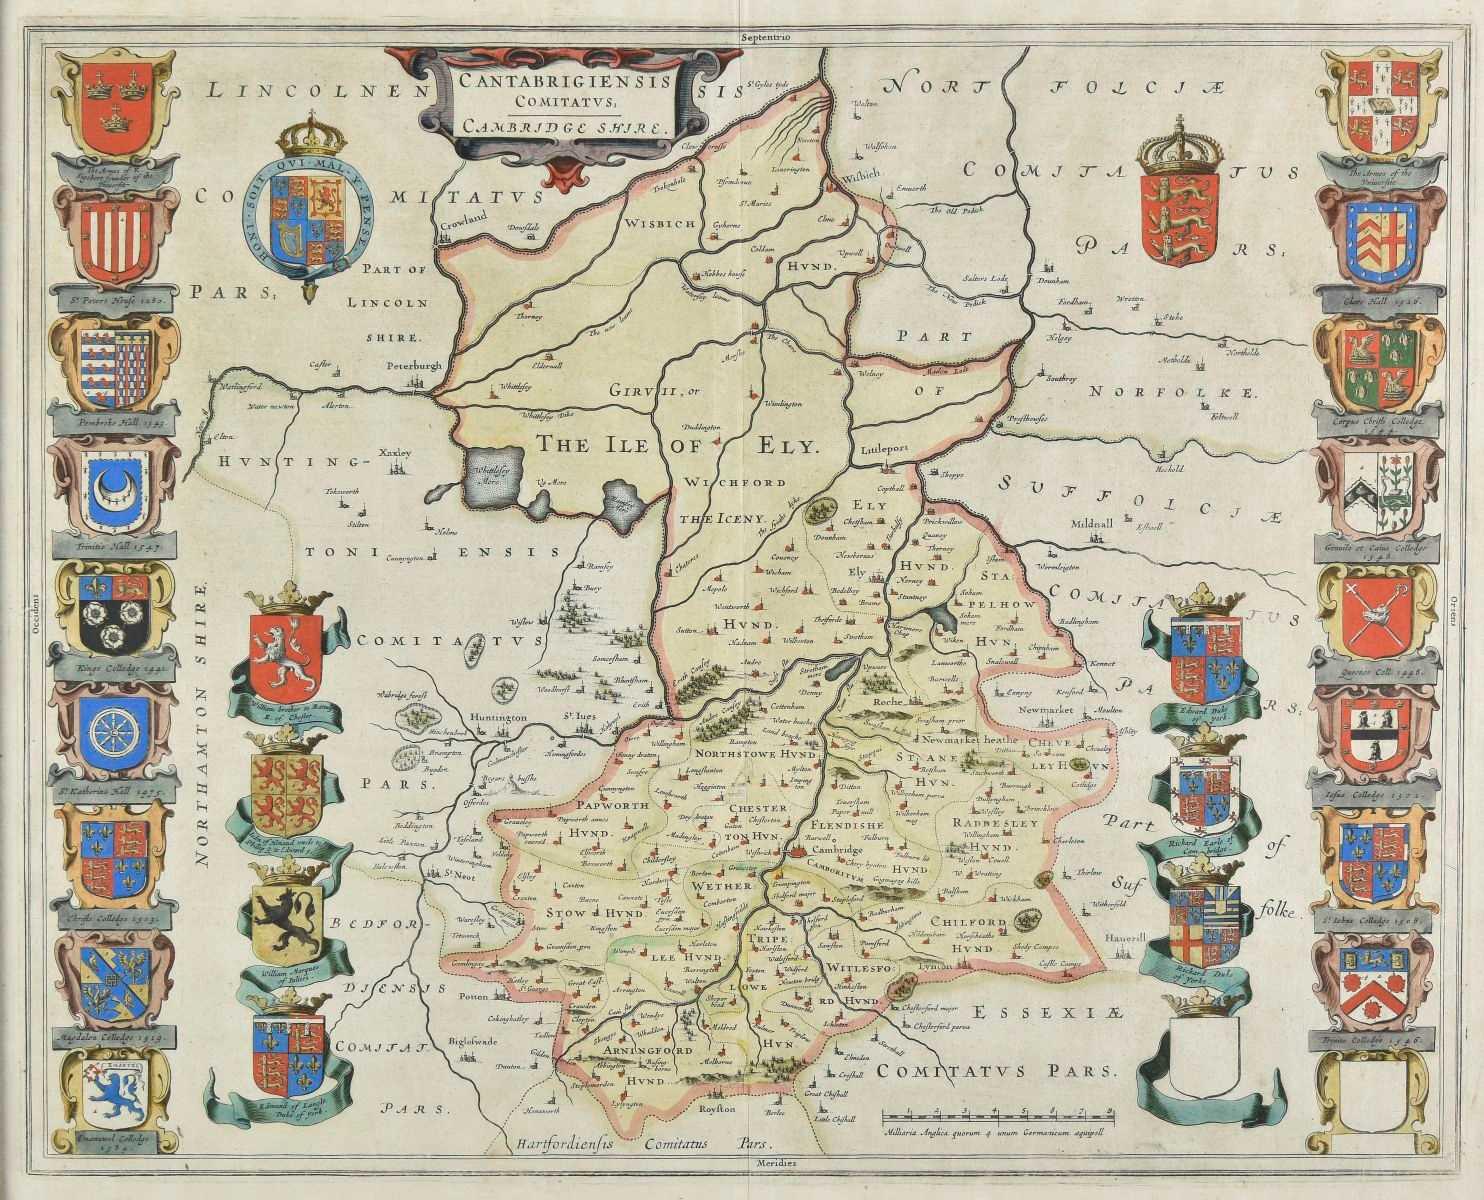 Lot 17-Cambridgeshire. Blaeu (J.), Cantabrigiensis comitatus, Cambridge Shire, circa 1645